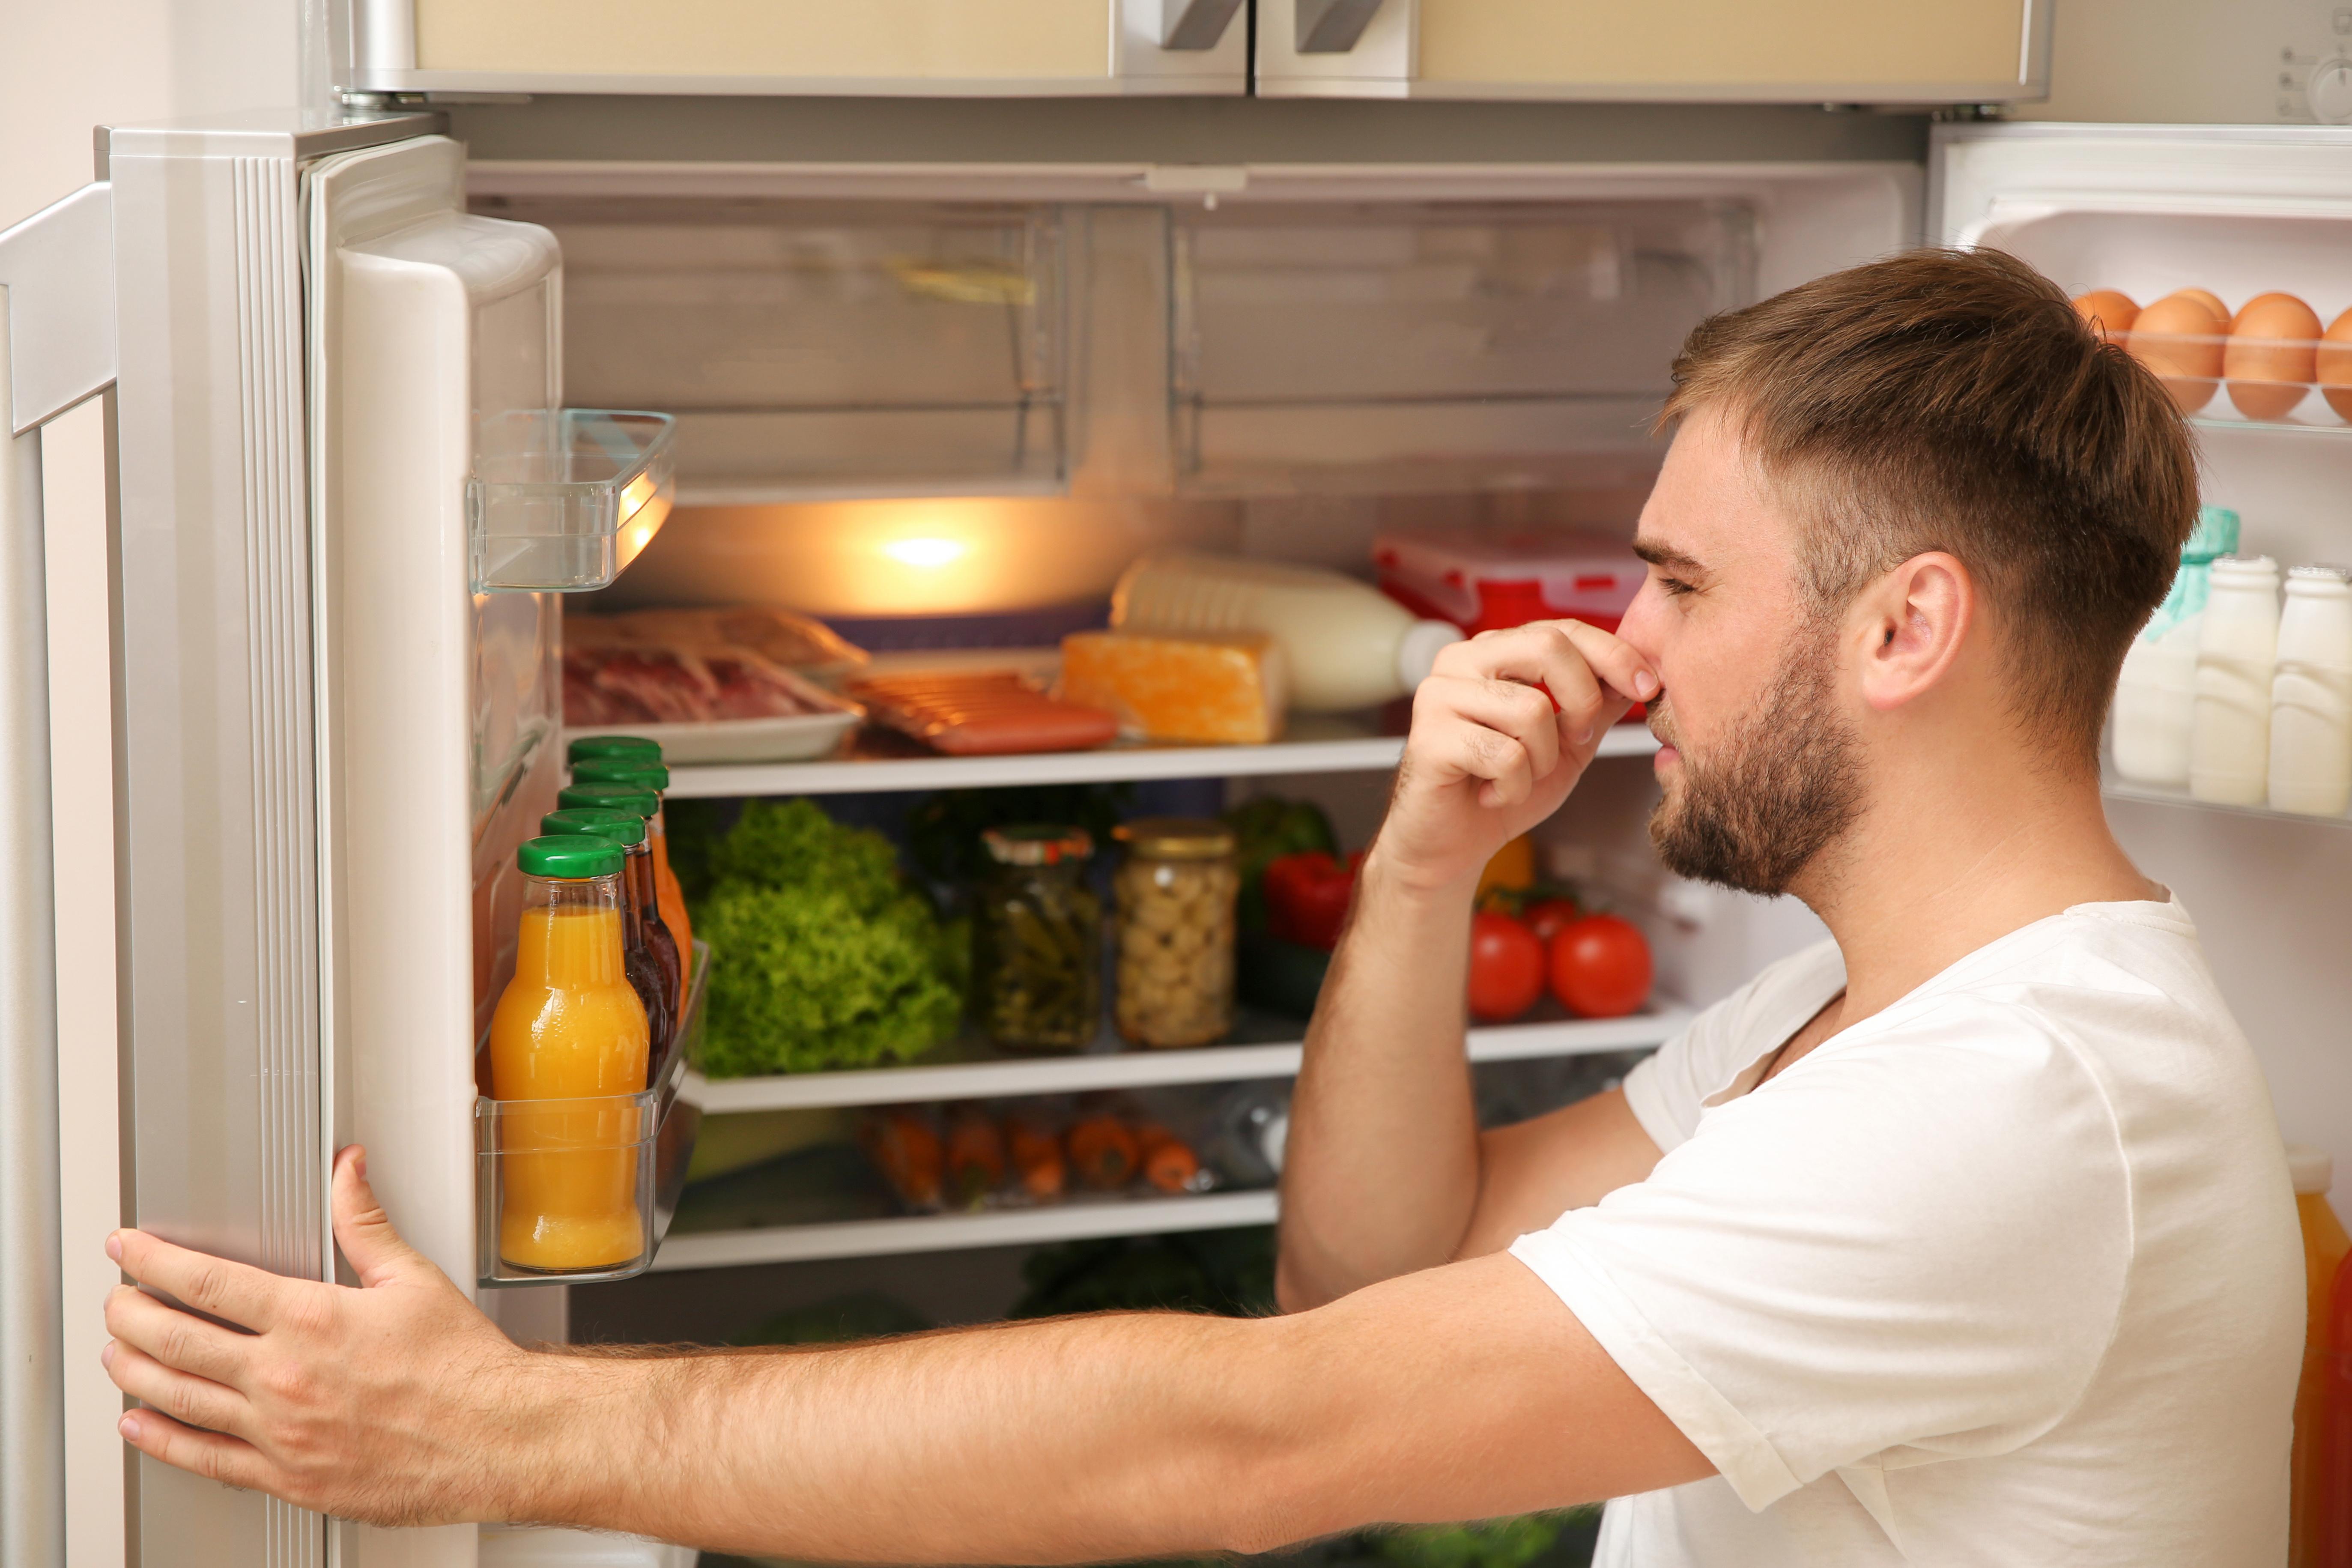 man cleaning stinky fridge